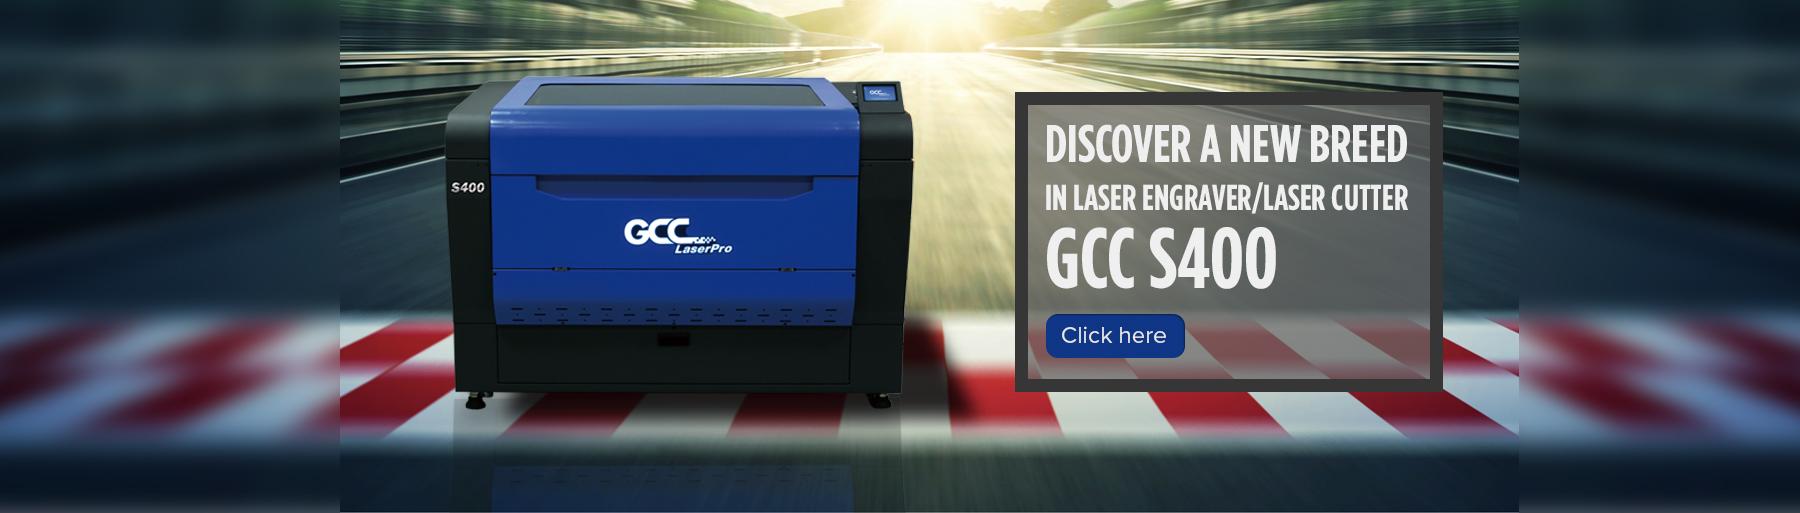 GCC LaserPro Co2 Laser Engravers / Laser Cutters   Grafityp UK Limited